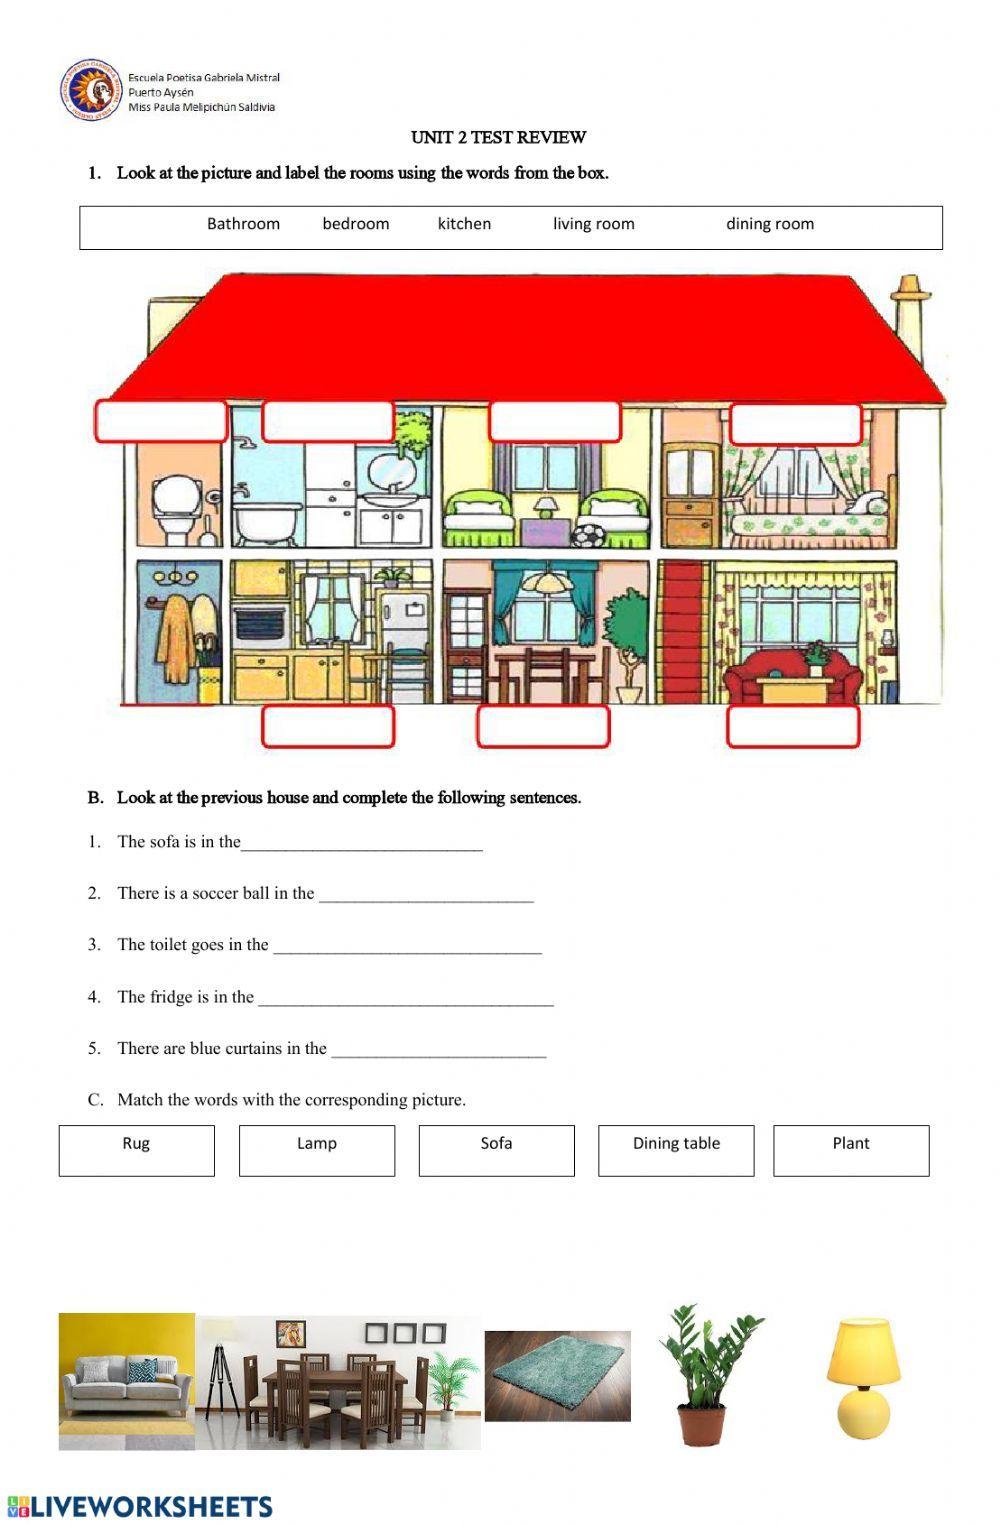 Unit 2 5th grade Interactive worksheet в 2020 г